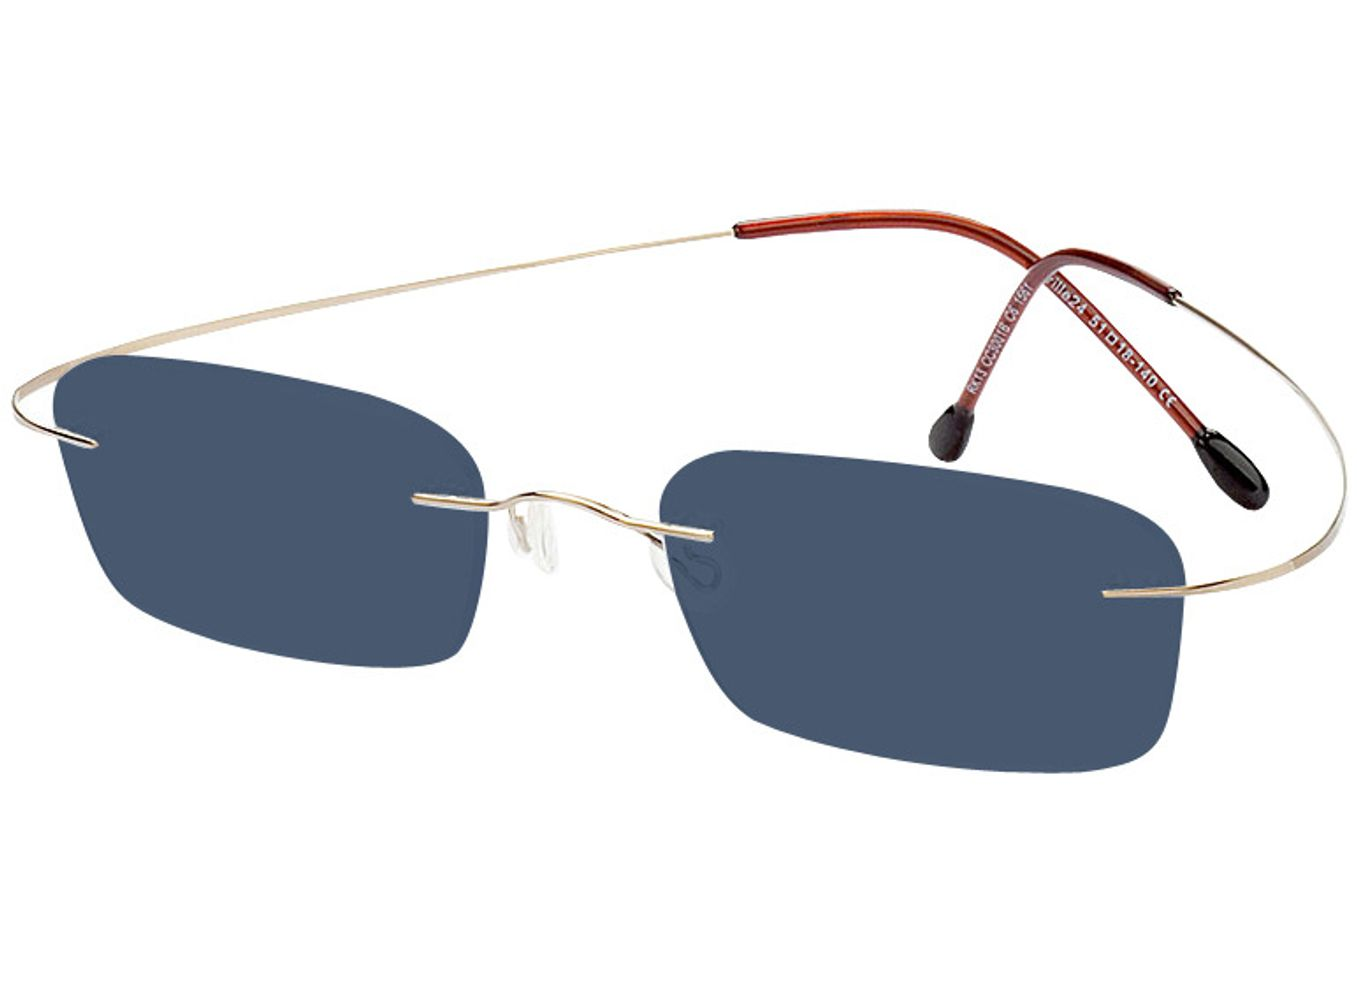 1561-singlevision-0285 Mackay-gold Sonnenbrille ohne Sehstärke, Randlos, Rechteckig Brille24 Collection